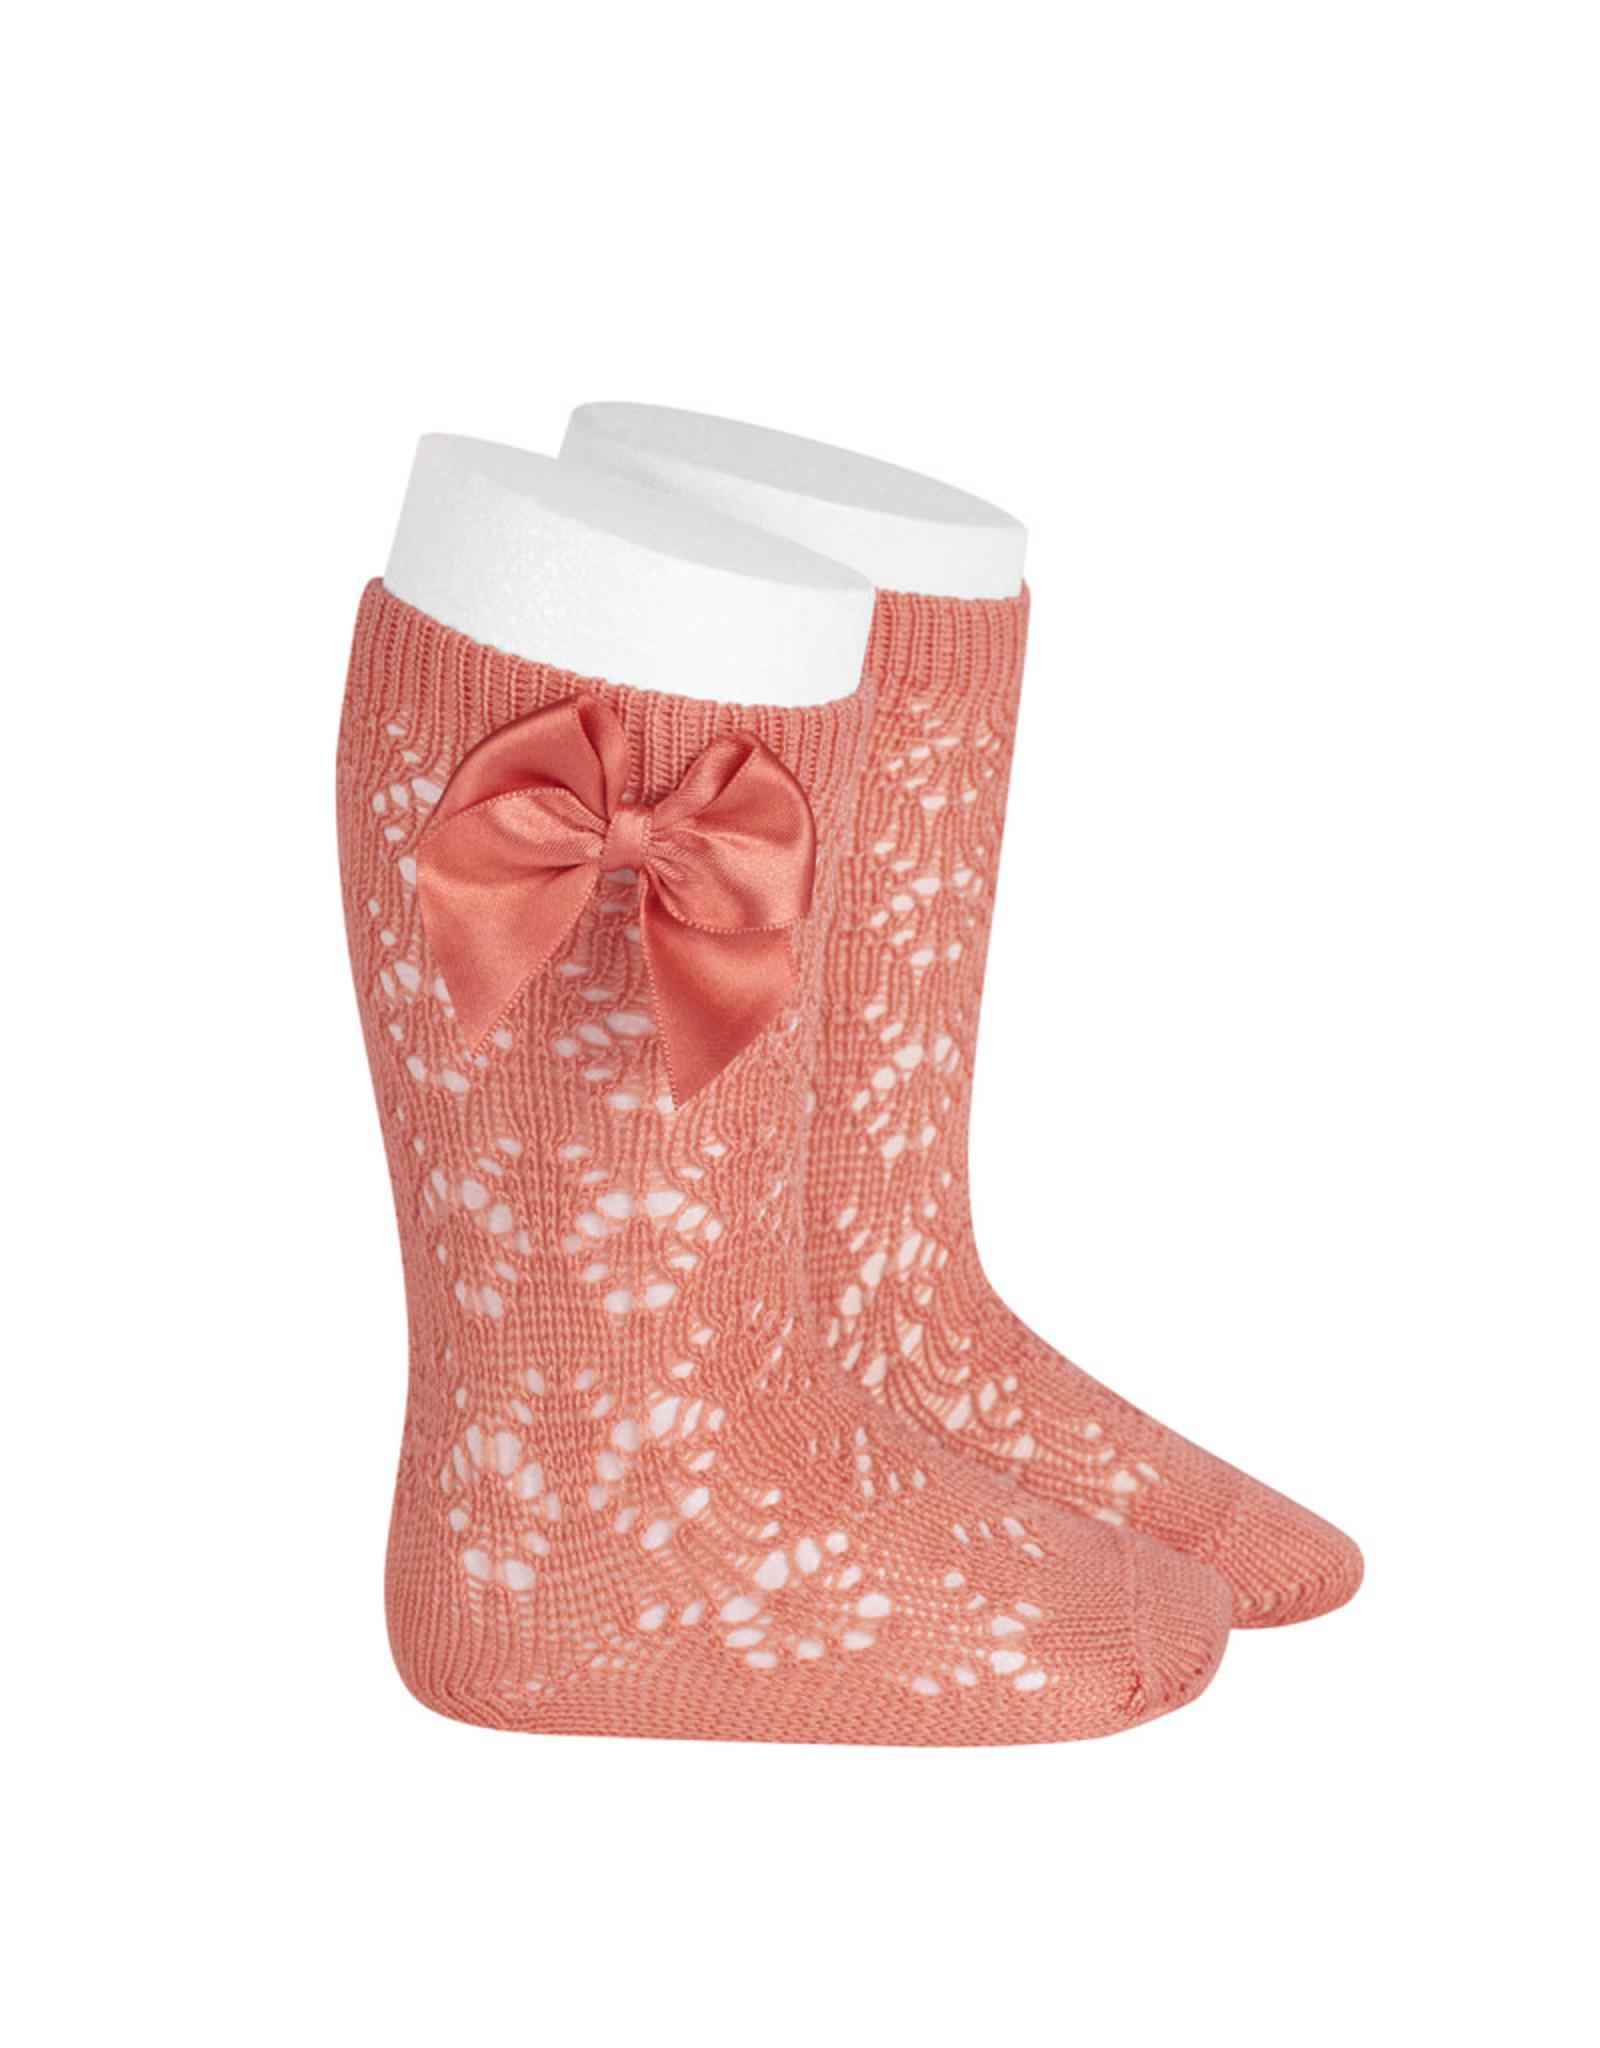 CONDOR Peony Geometric Socks with Bow